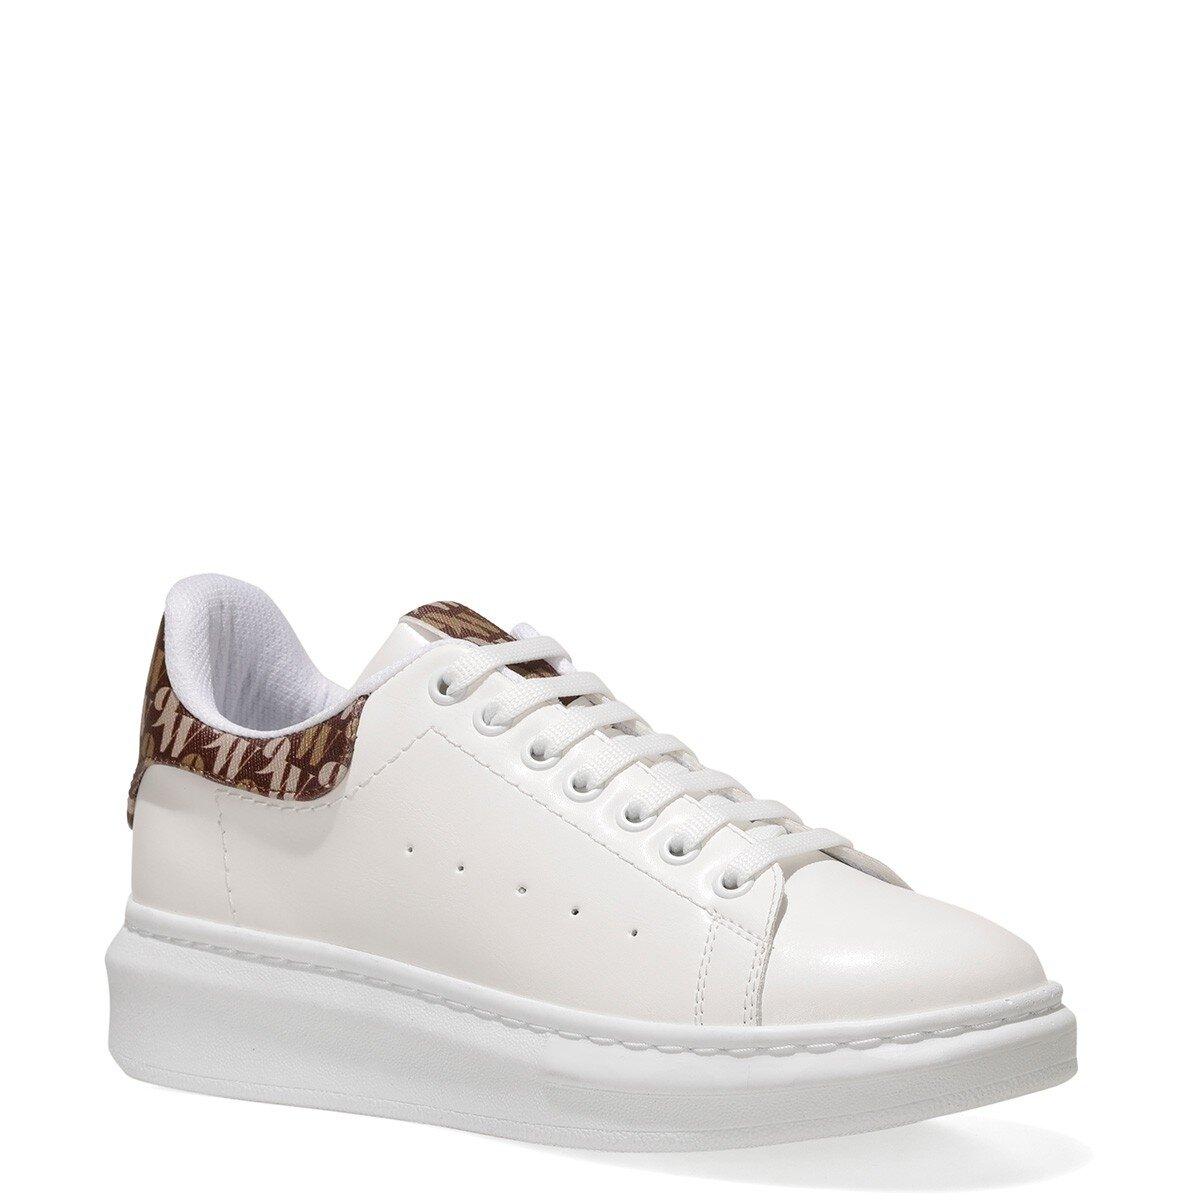 HERESA 1FX Kahverengi Kadın Sneaker